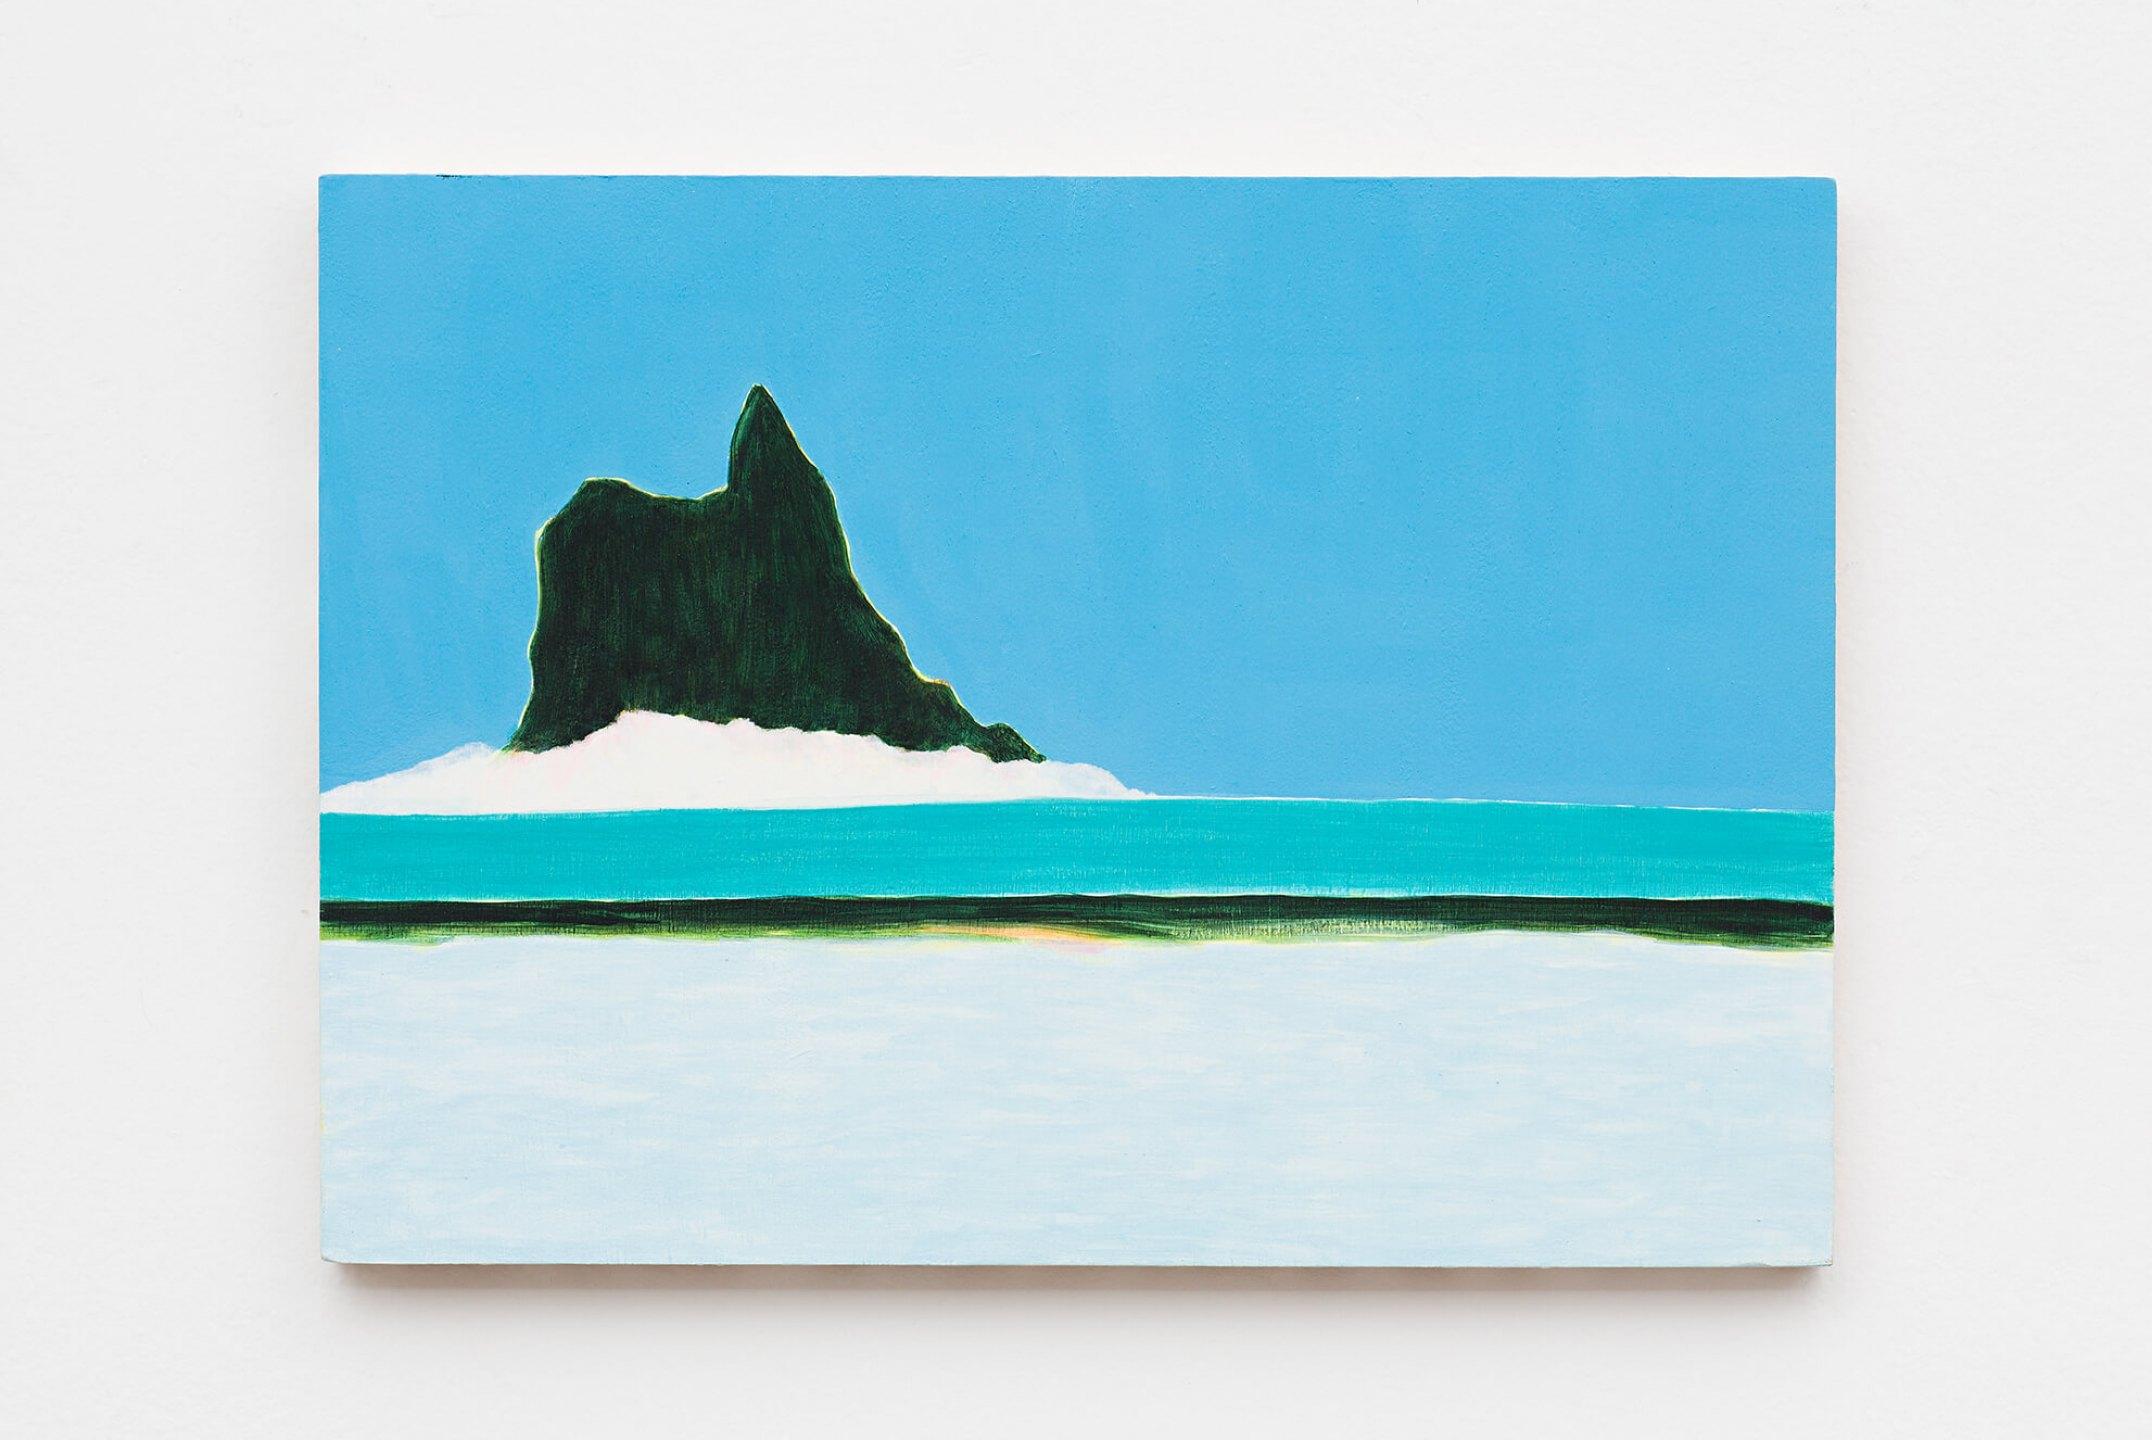 Patricia Leite, <em>Atalaia,</em> 2013, oil on wood, 30×40 cm - Mendes Wood DM